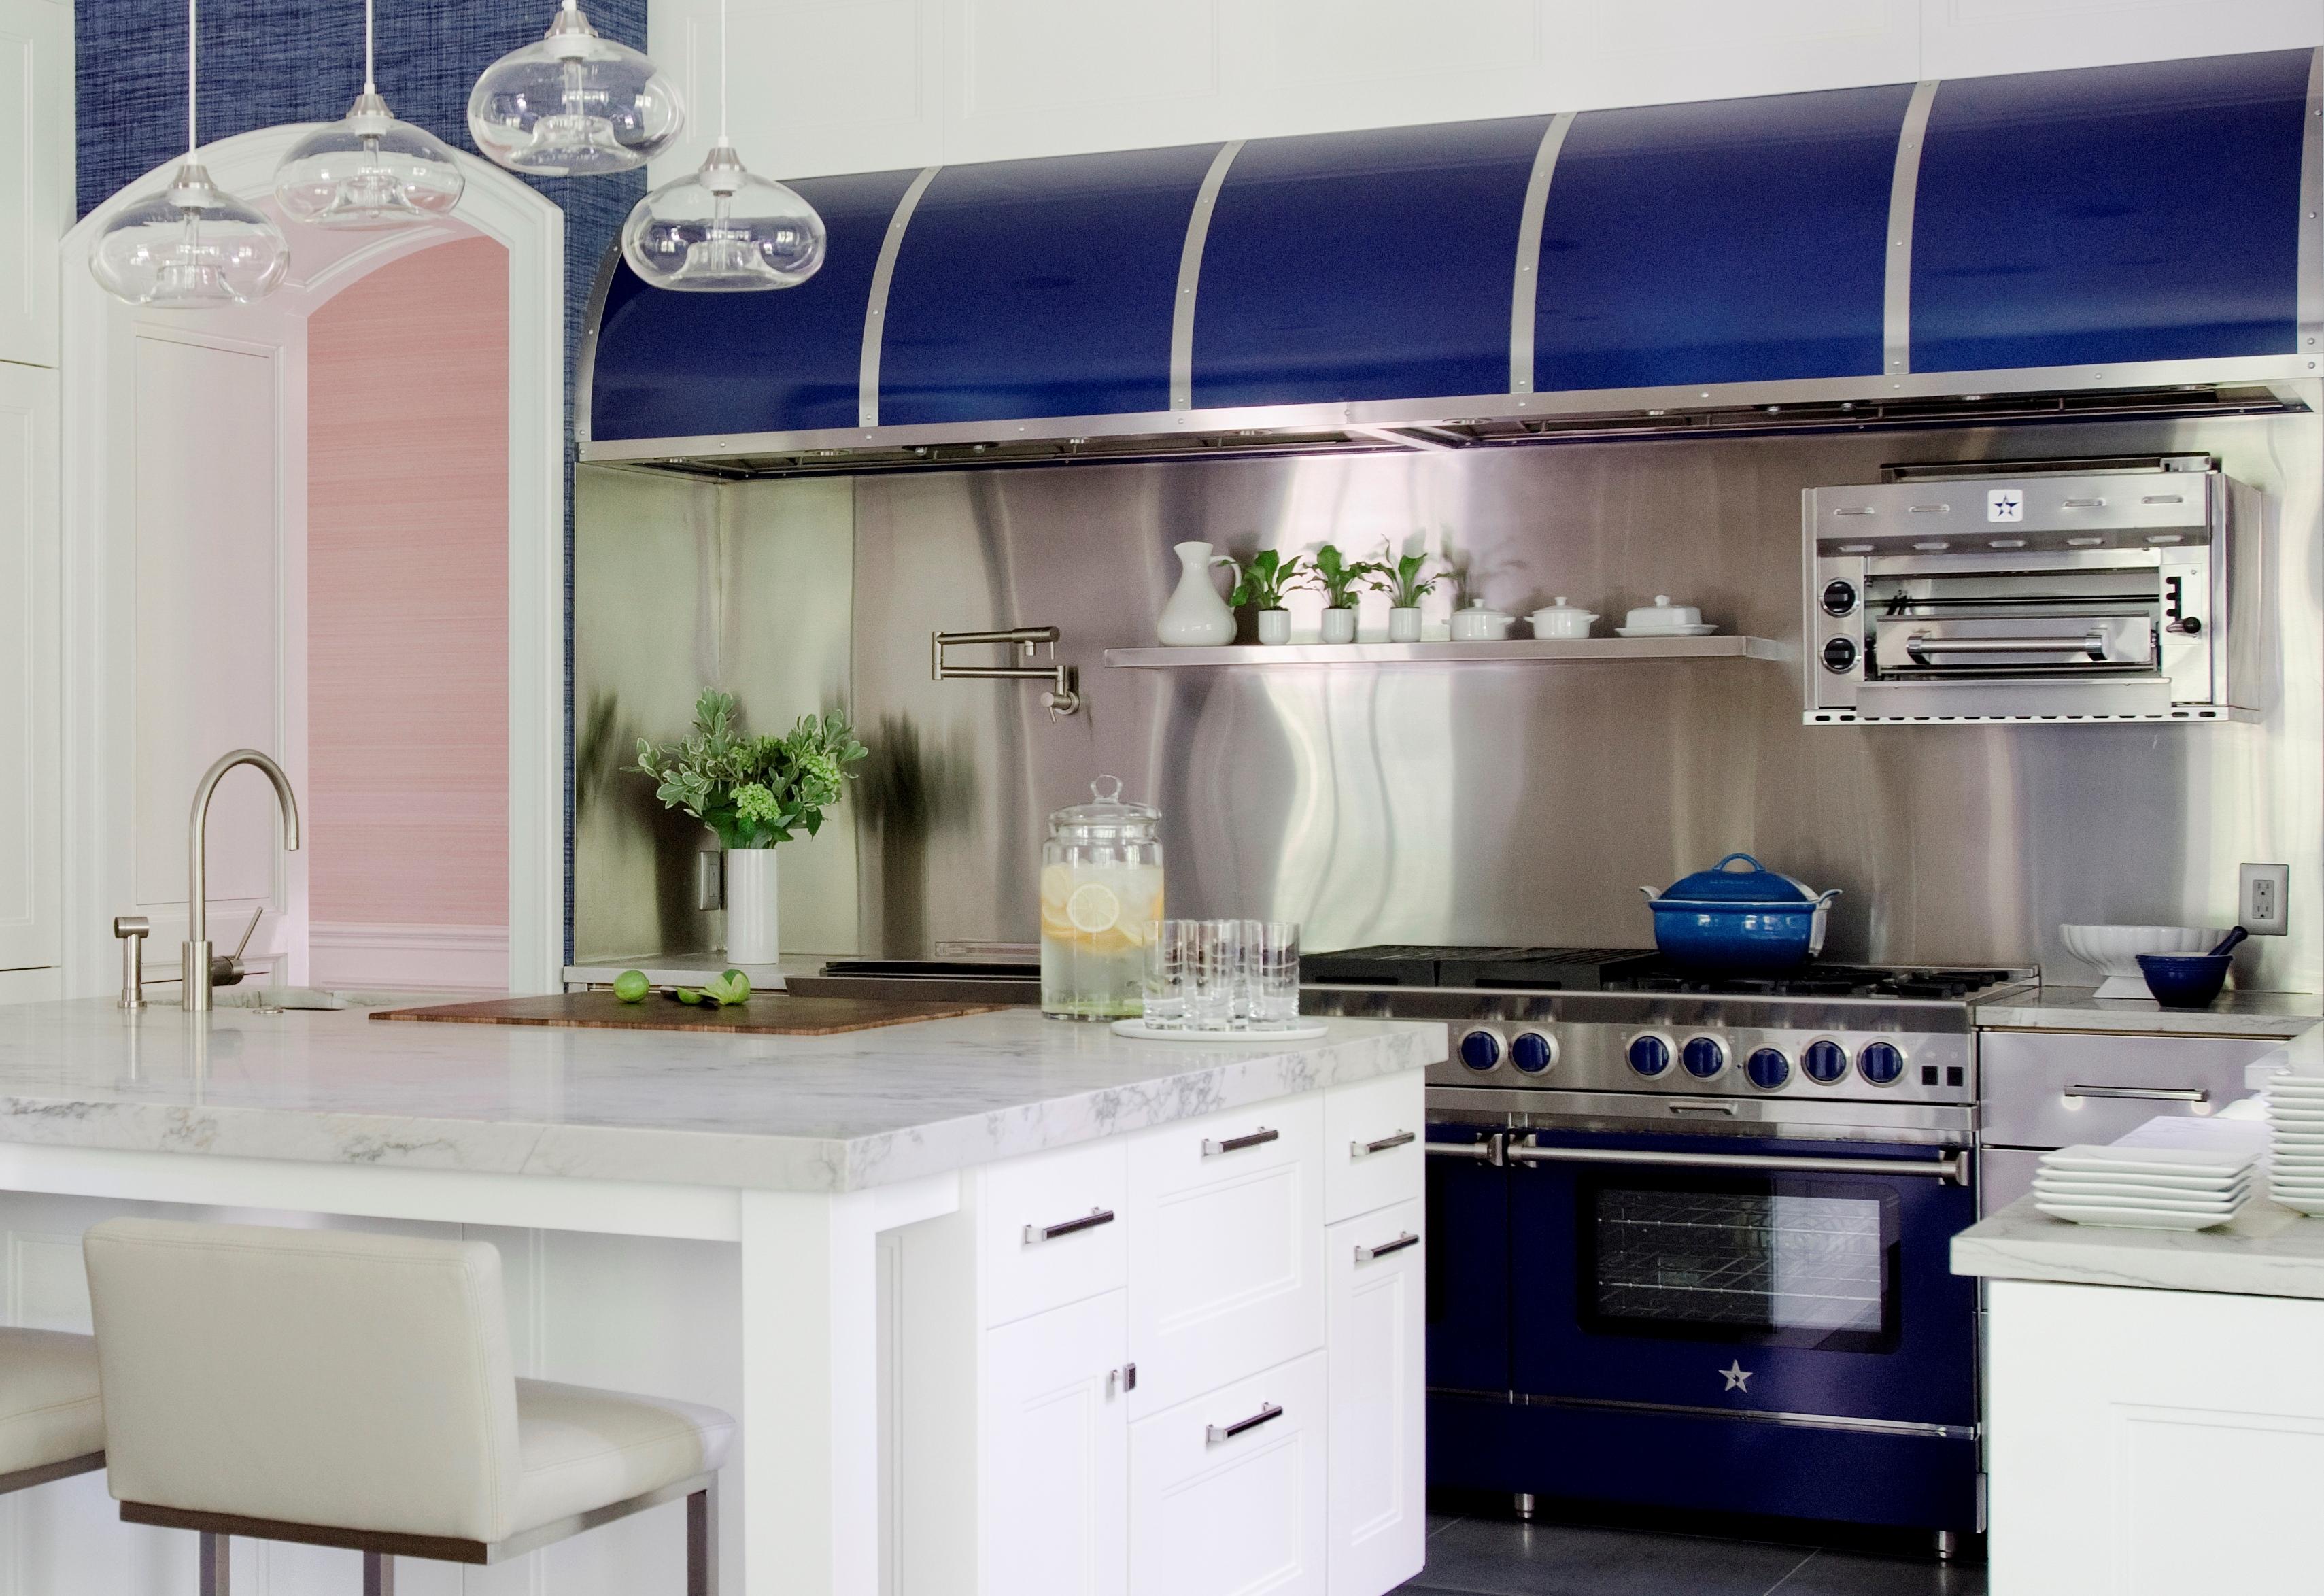 Absorbing Bluestar Kitchen Design Contest Copy Bluestar Blue Star Appliances Near Me Discount Blue Star Appliances houzz-03 Blue Star Appliances